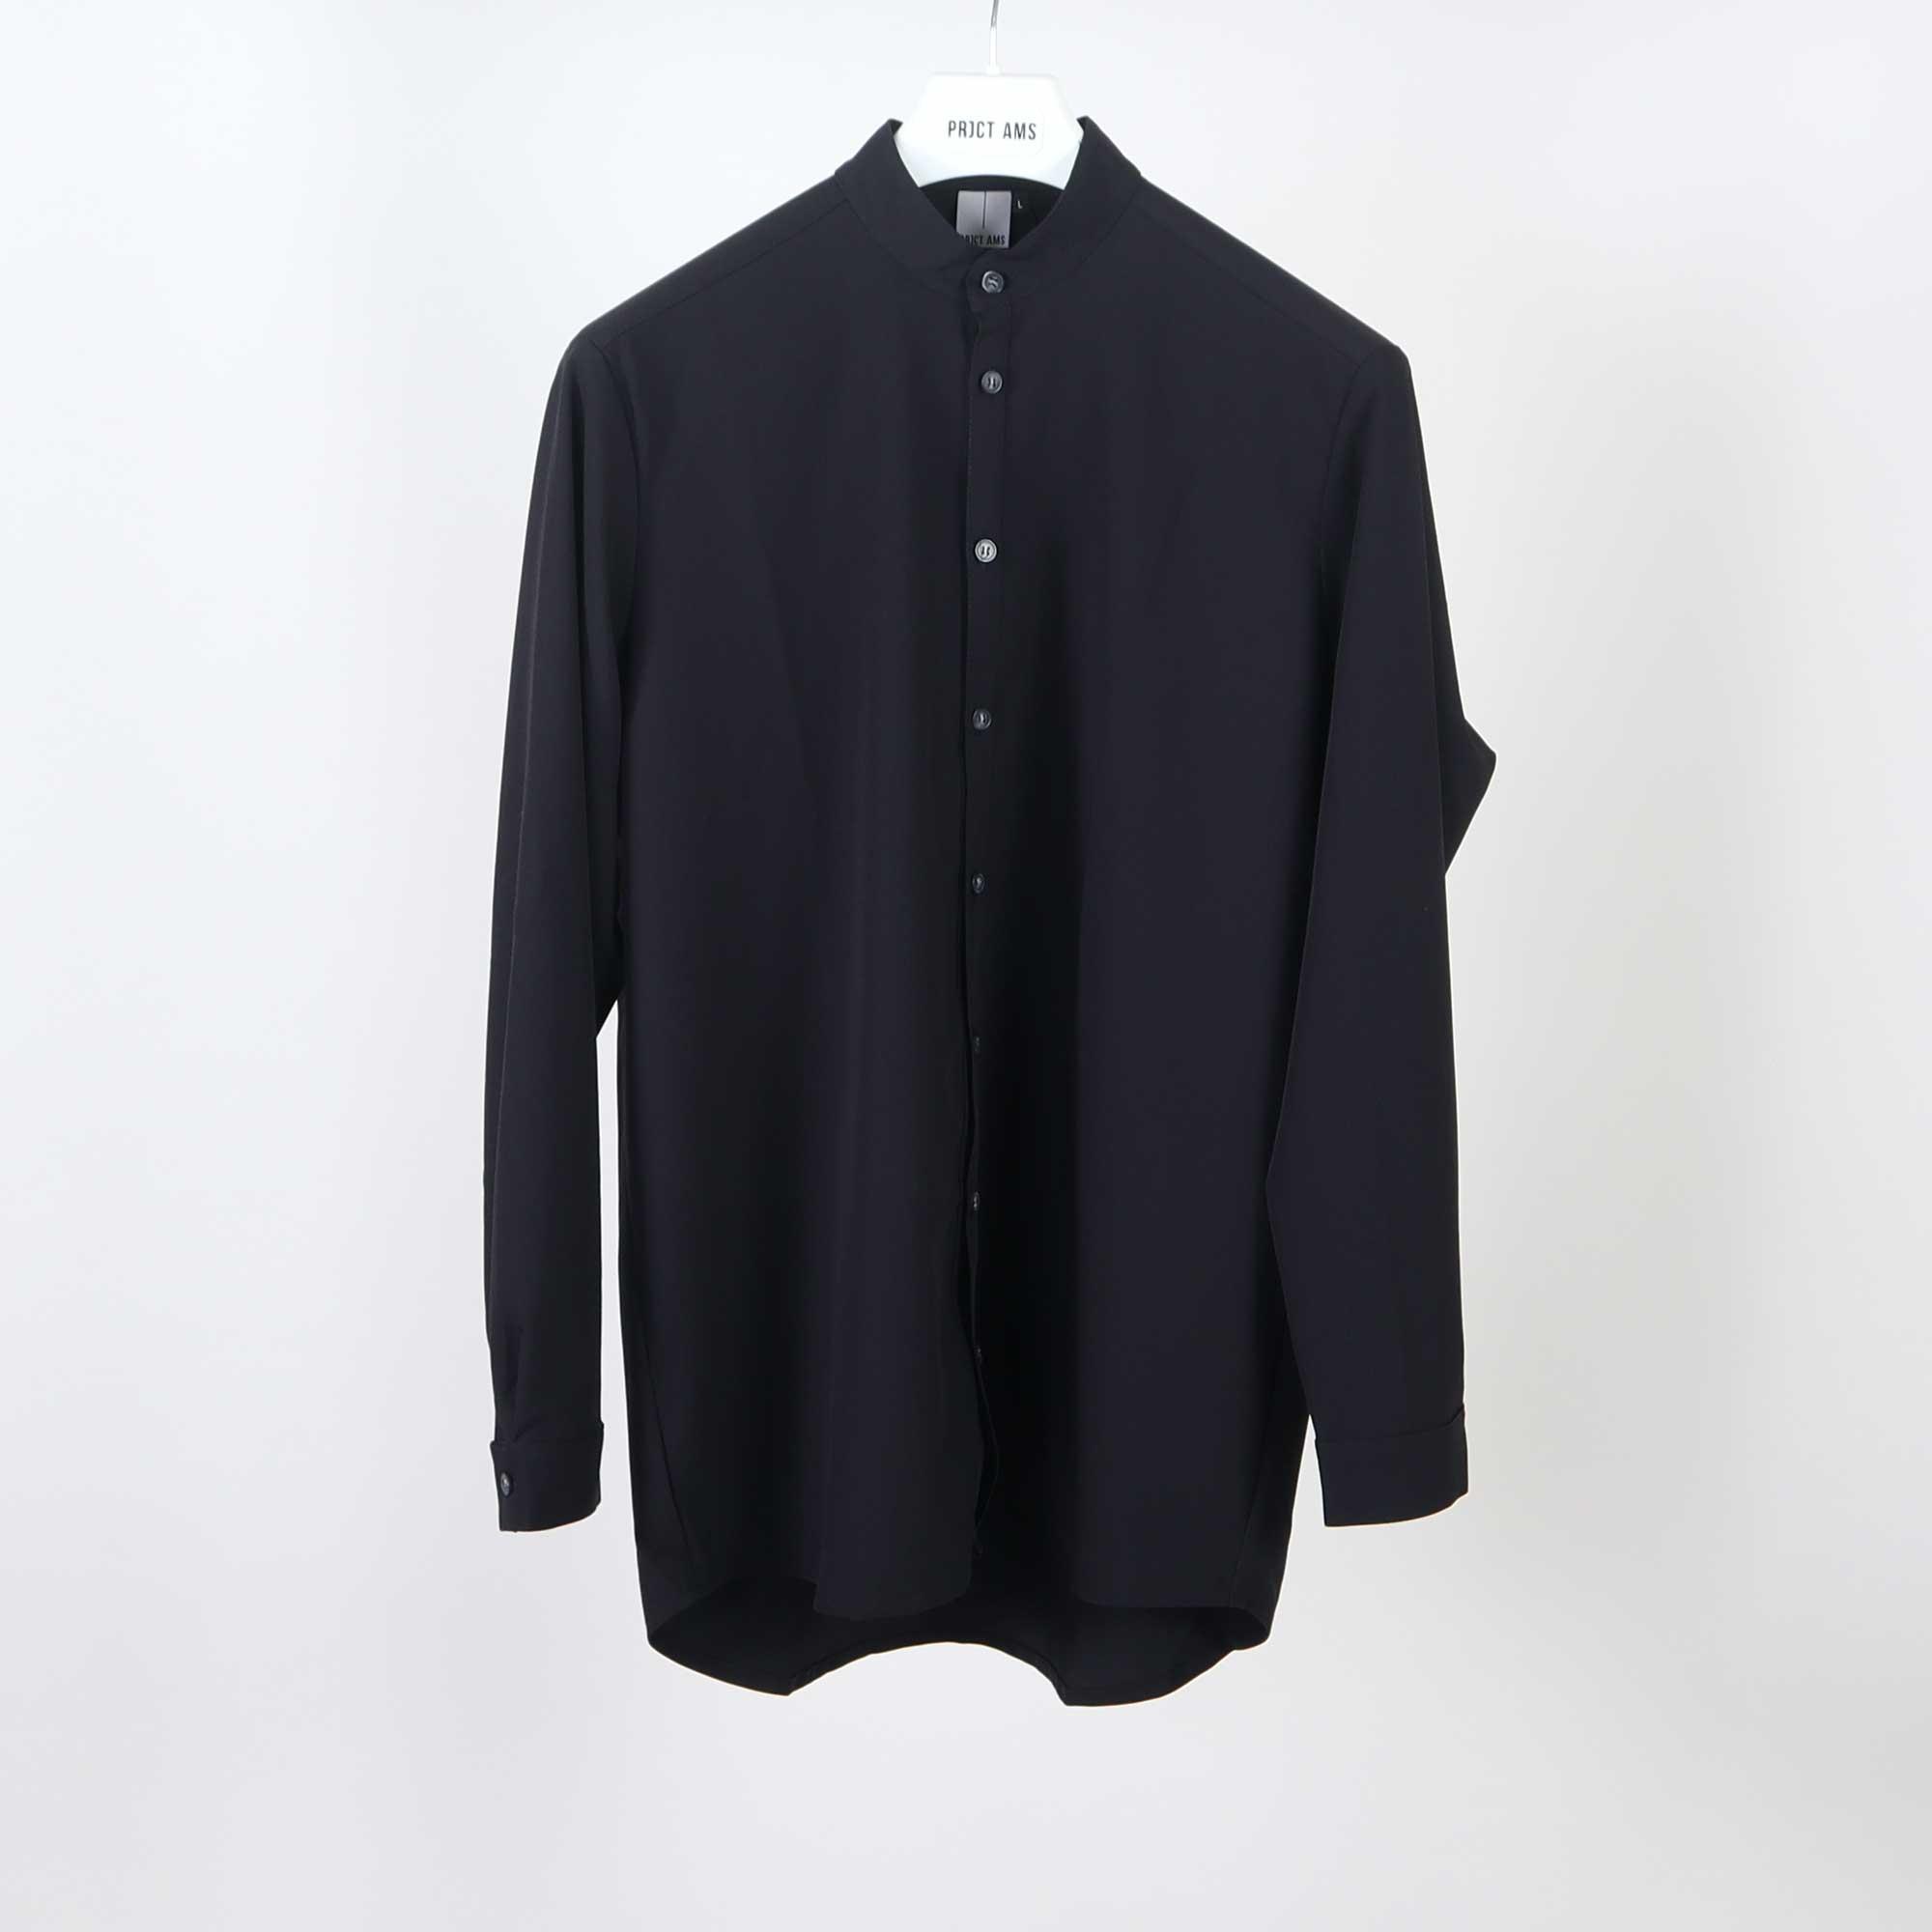 zippy-zwart-10